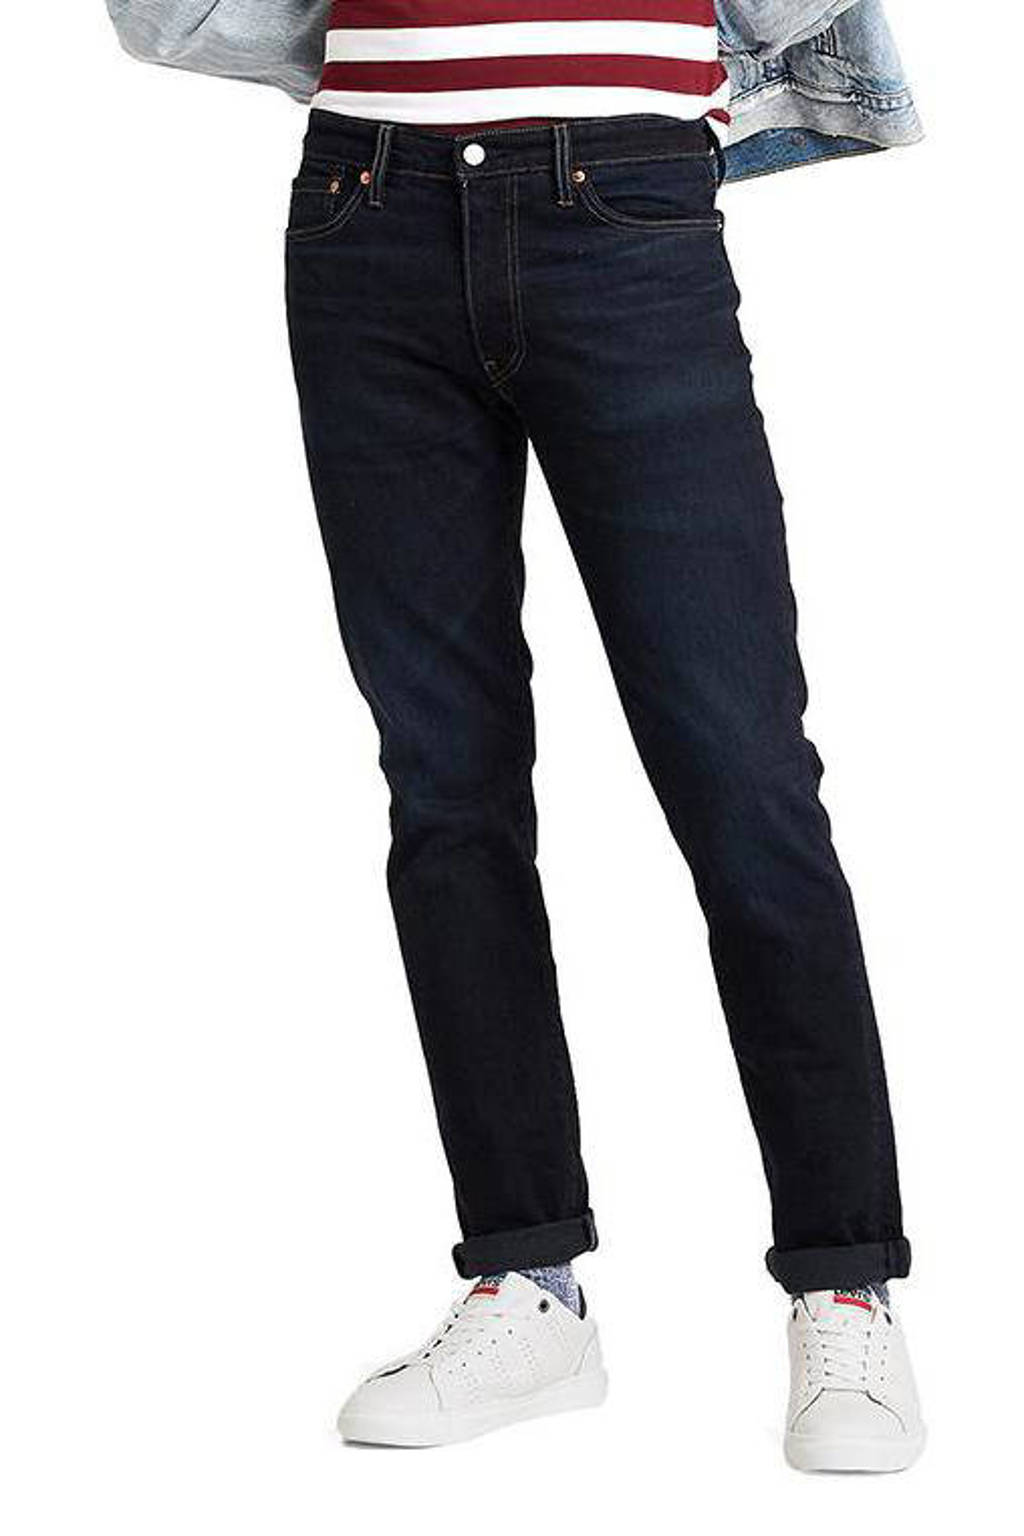 Levi's 511 slim fit jeans dark denim, Dark denim